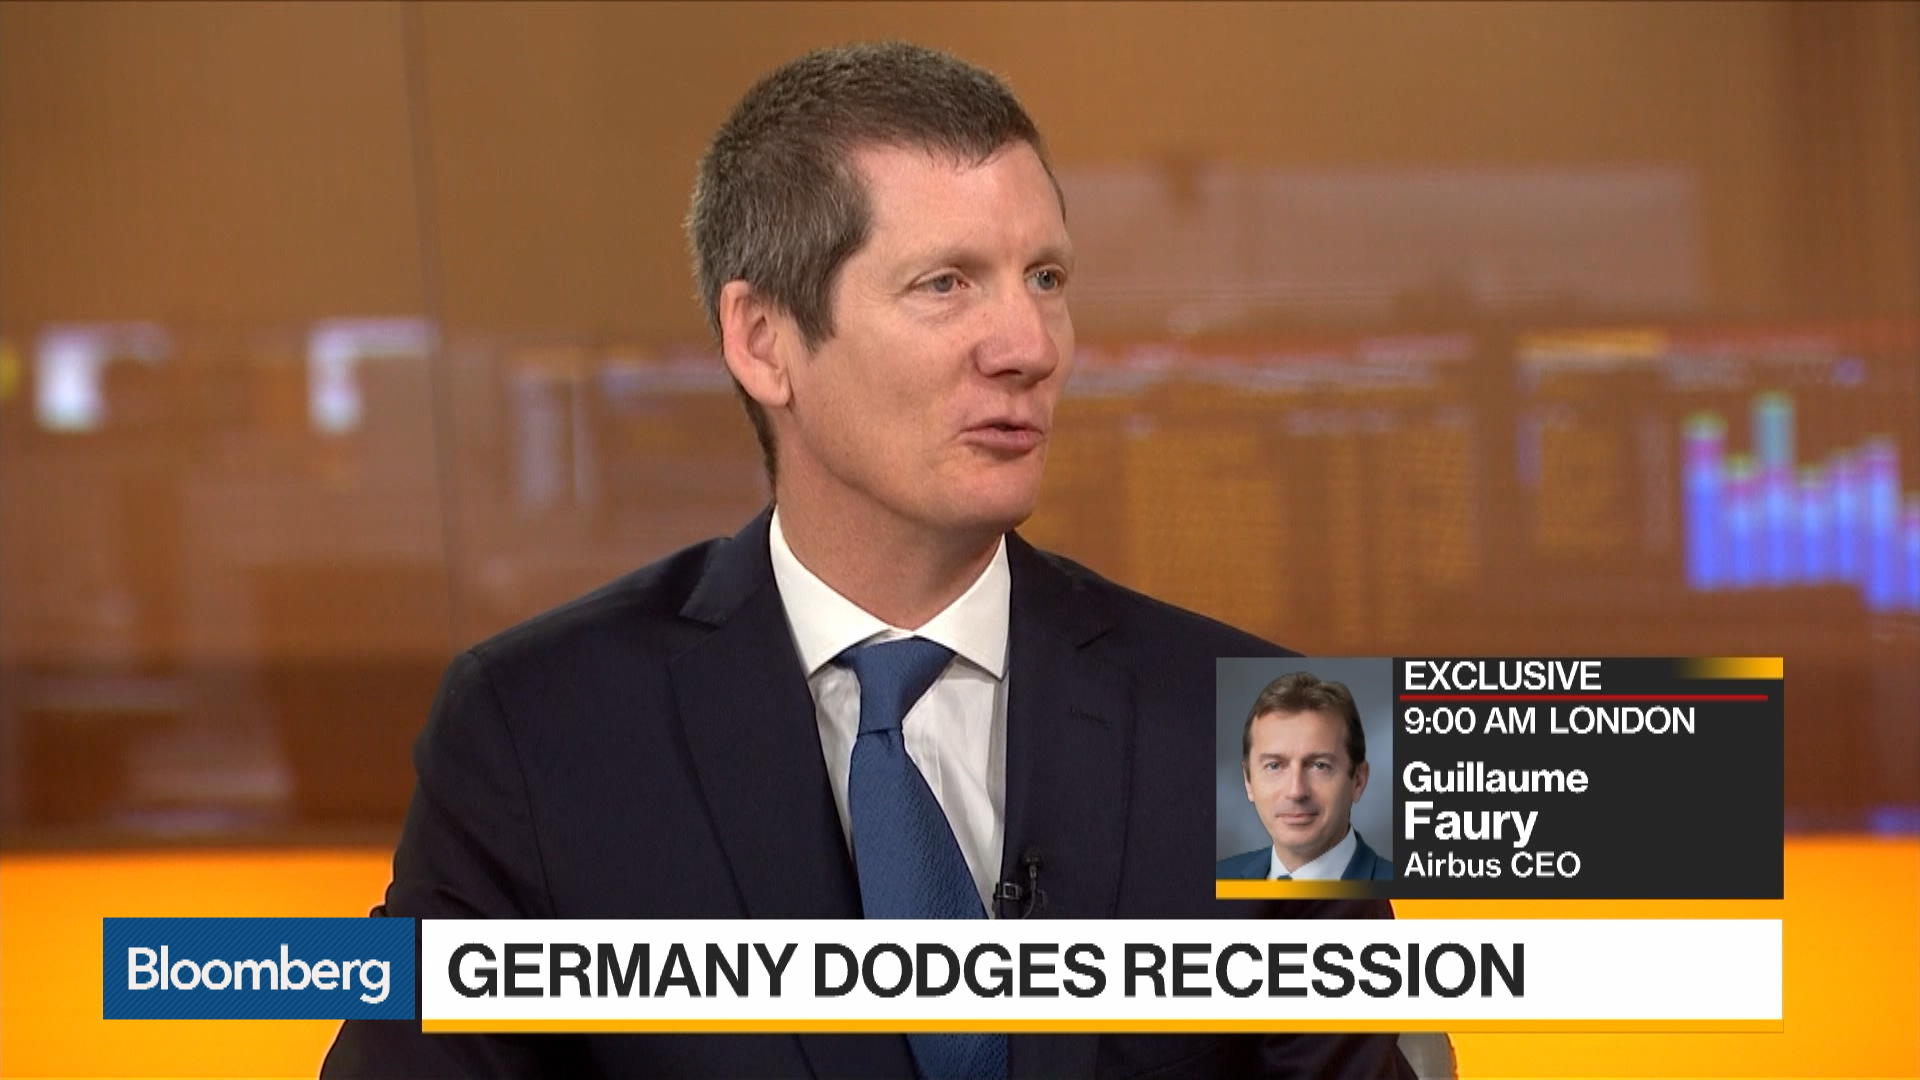 German Bund Yields Could Decline in 2020, Says Guy Stear of Societe Generale